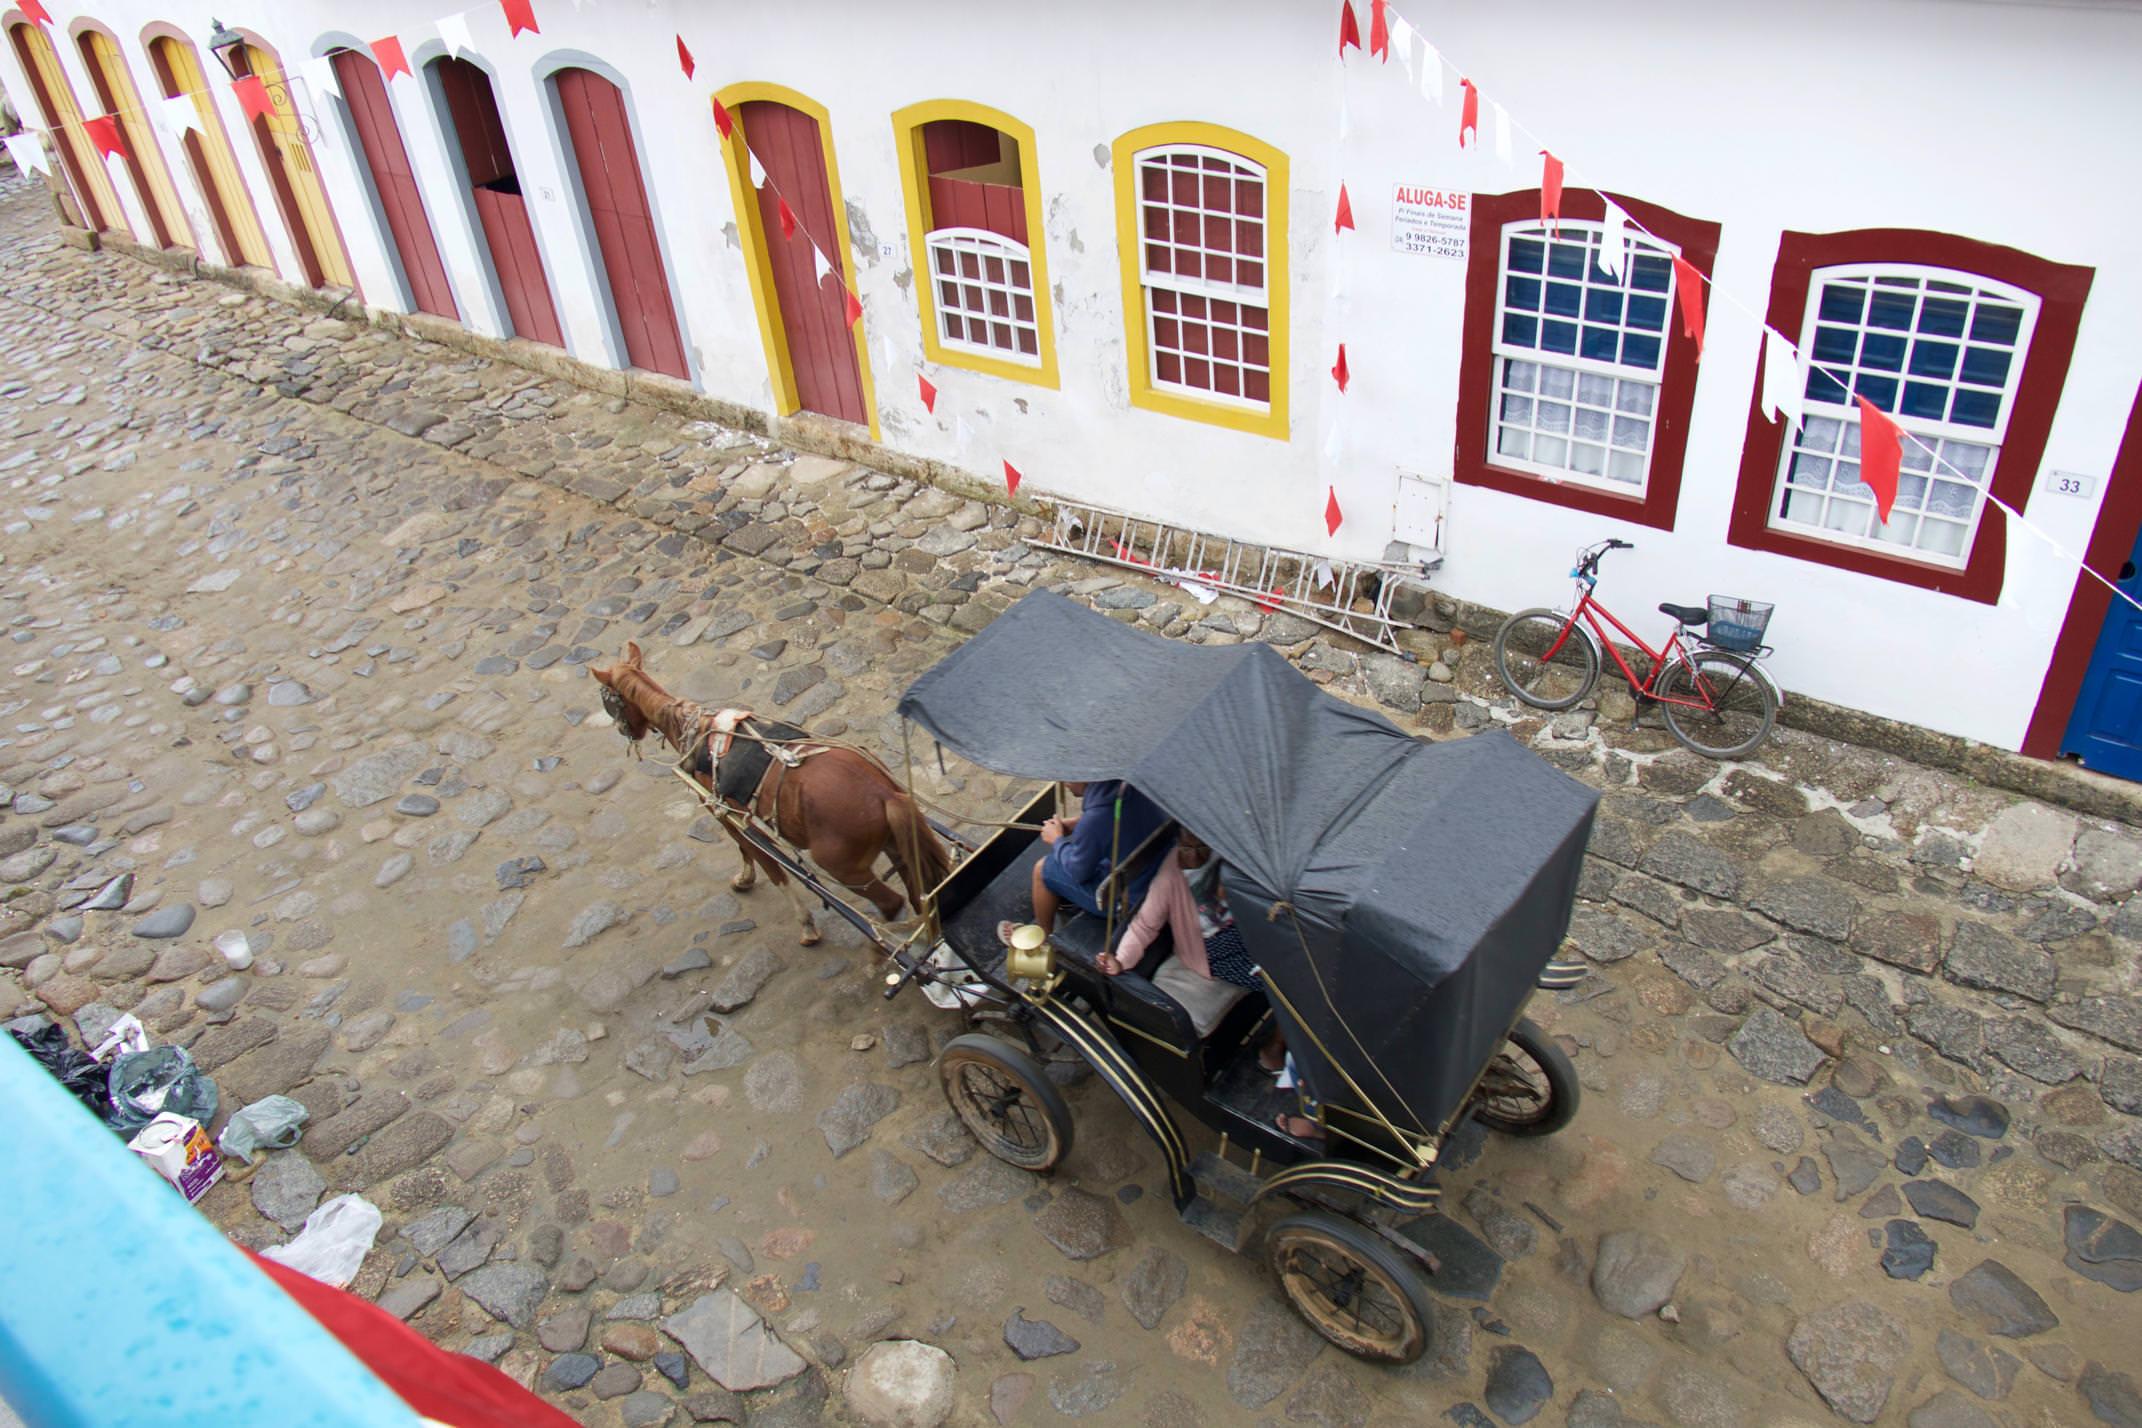 Brazil paraty horse and carriage copyright pura aventura thomas power